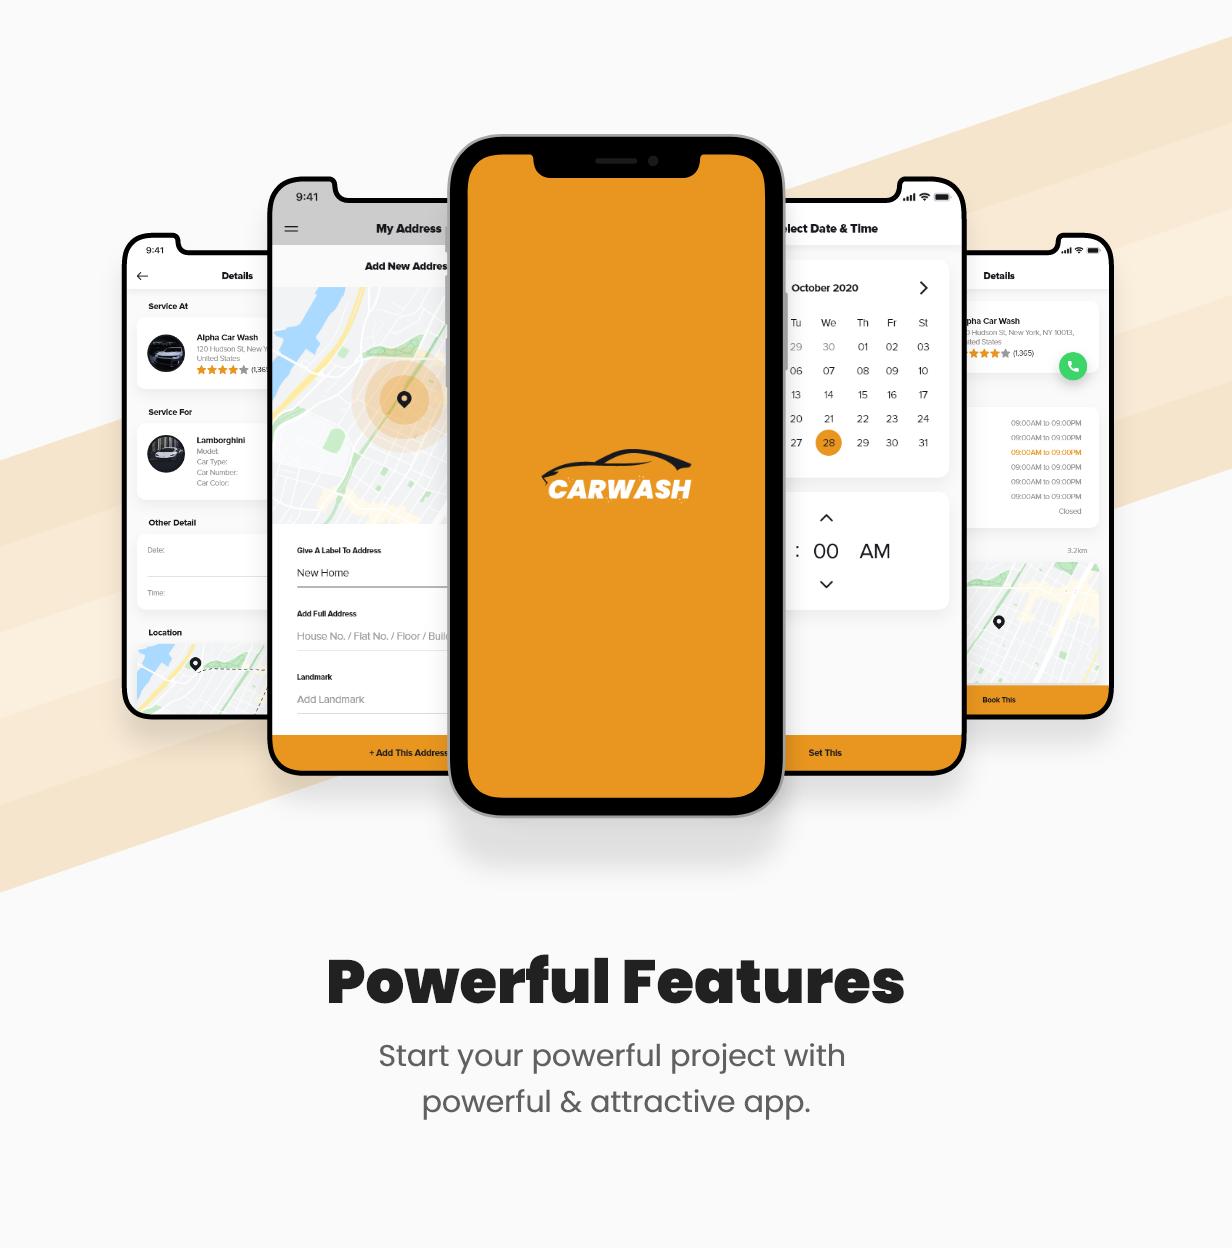 Carwash Car Repair App Template Ionic 5 Android Ios By Saasmonks